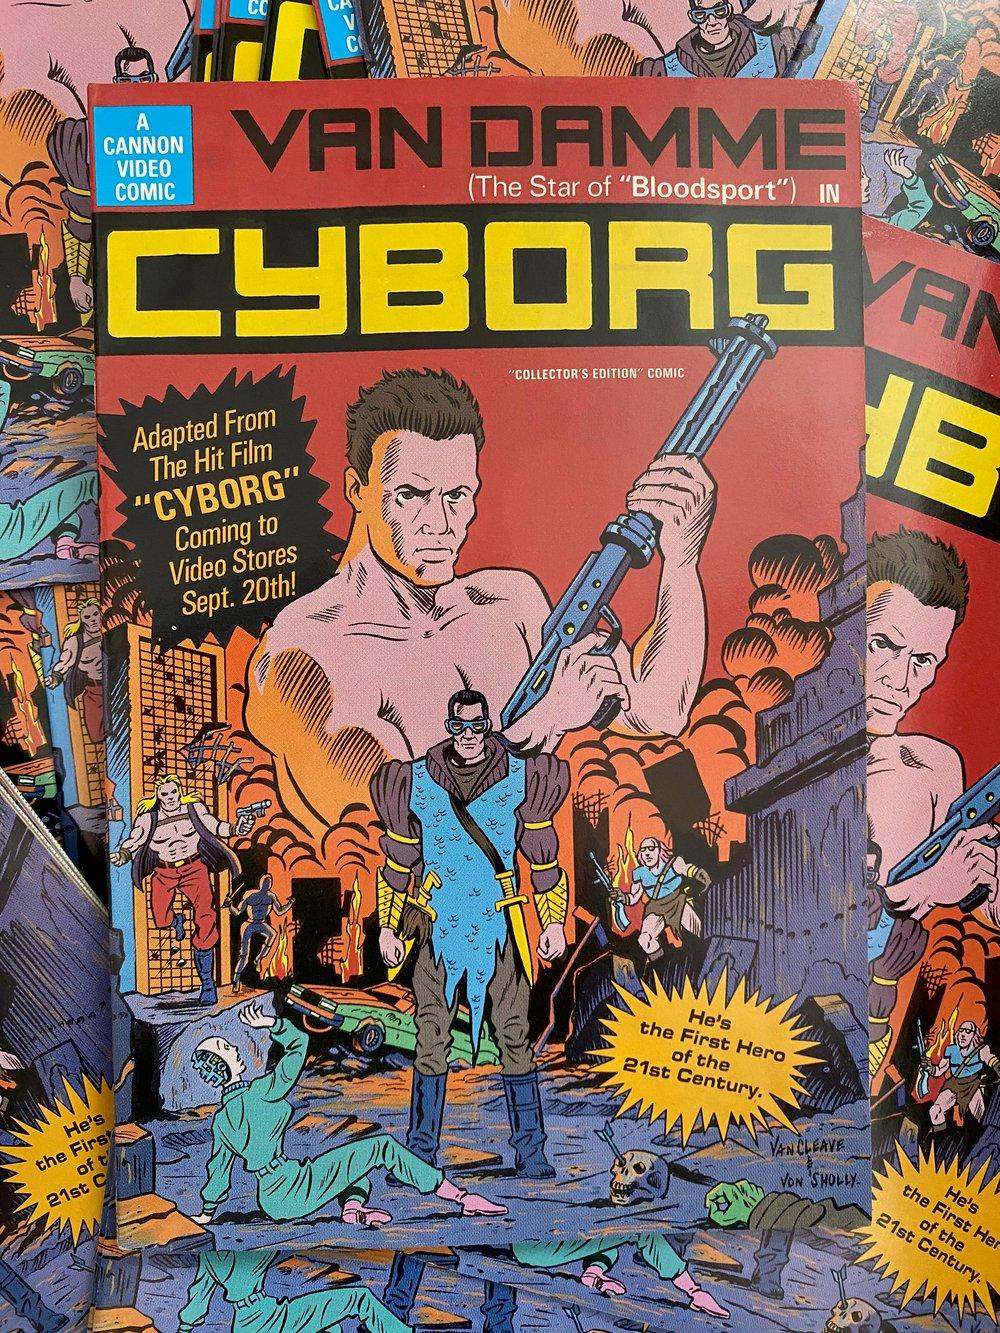 1991 CYBORG PROMOTIONAL COMIC BOOK- CANNON VIDEO COMICS